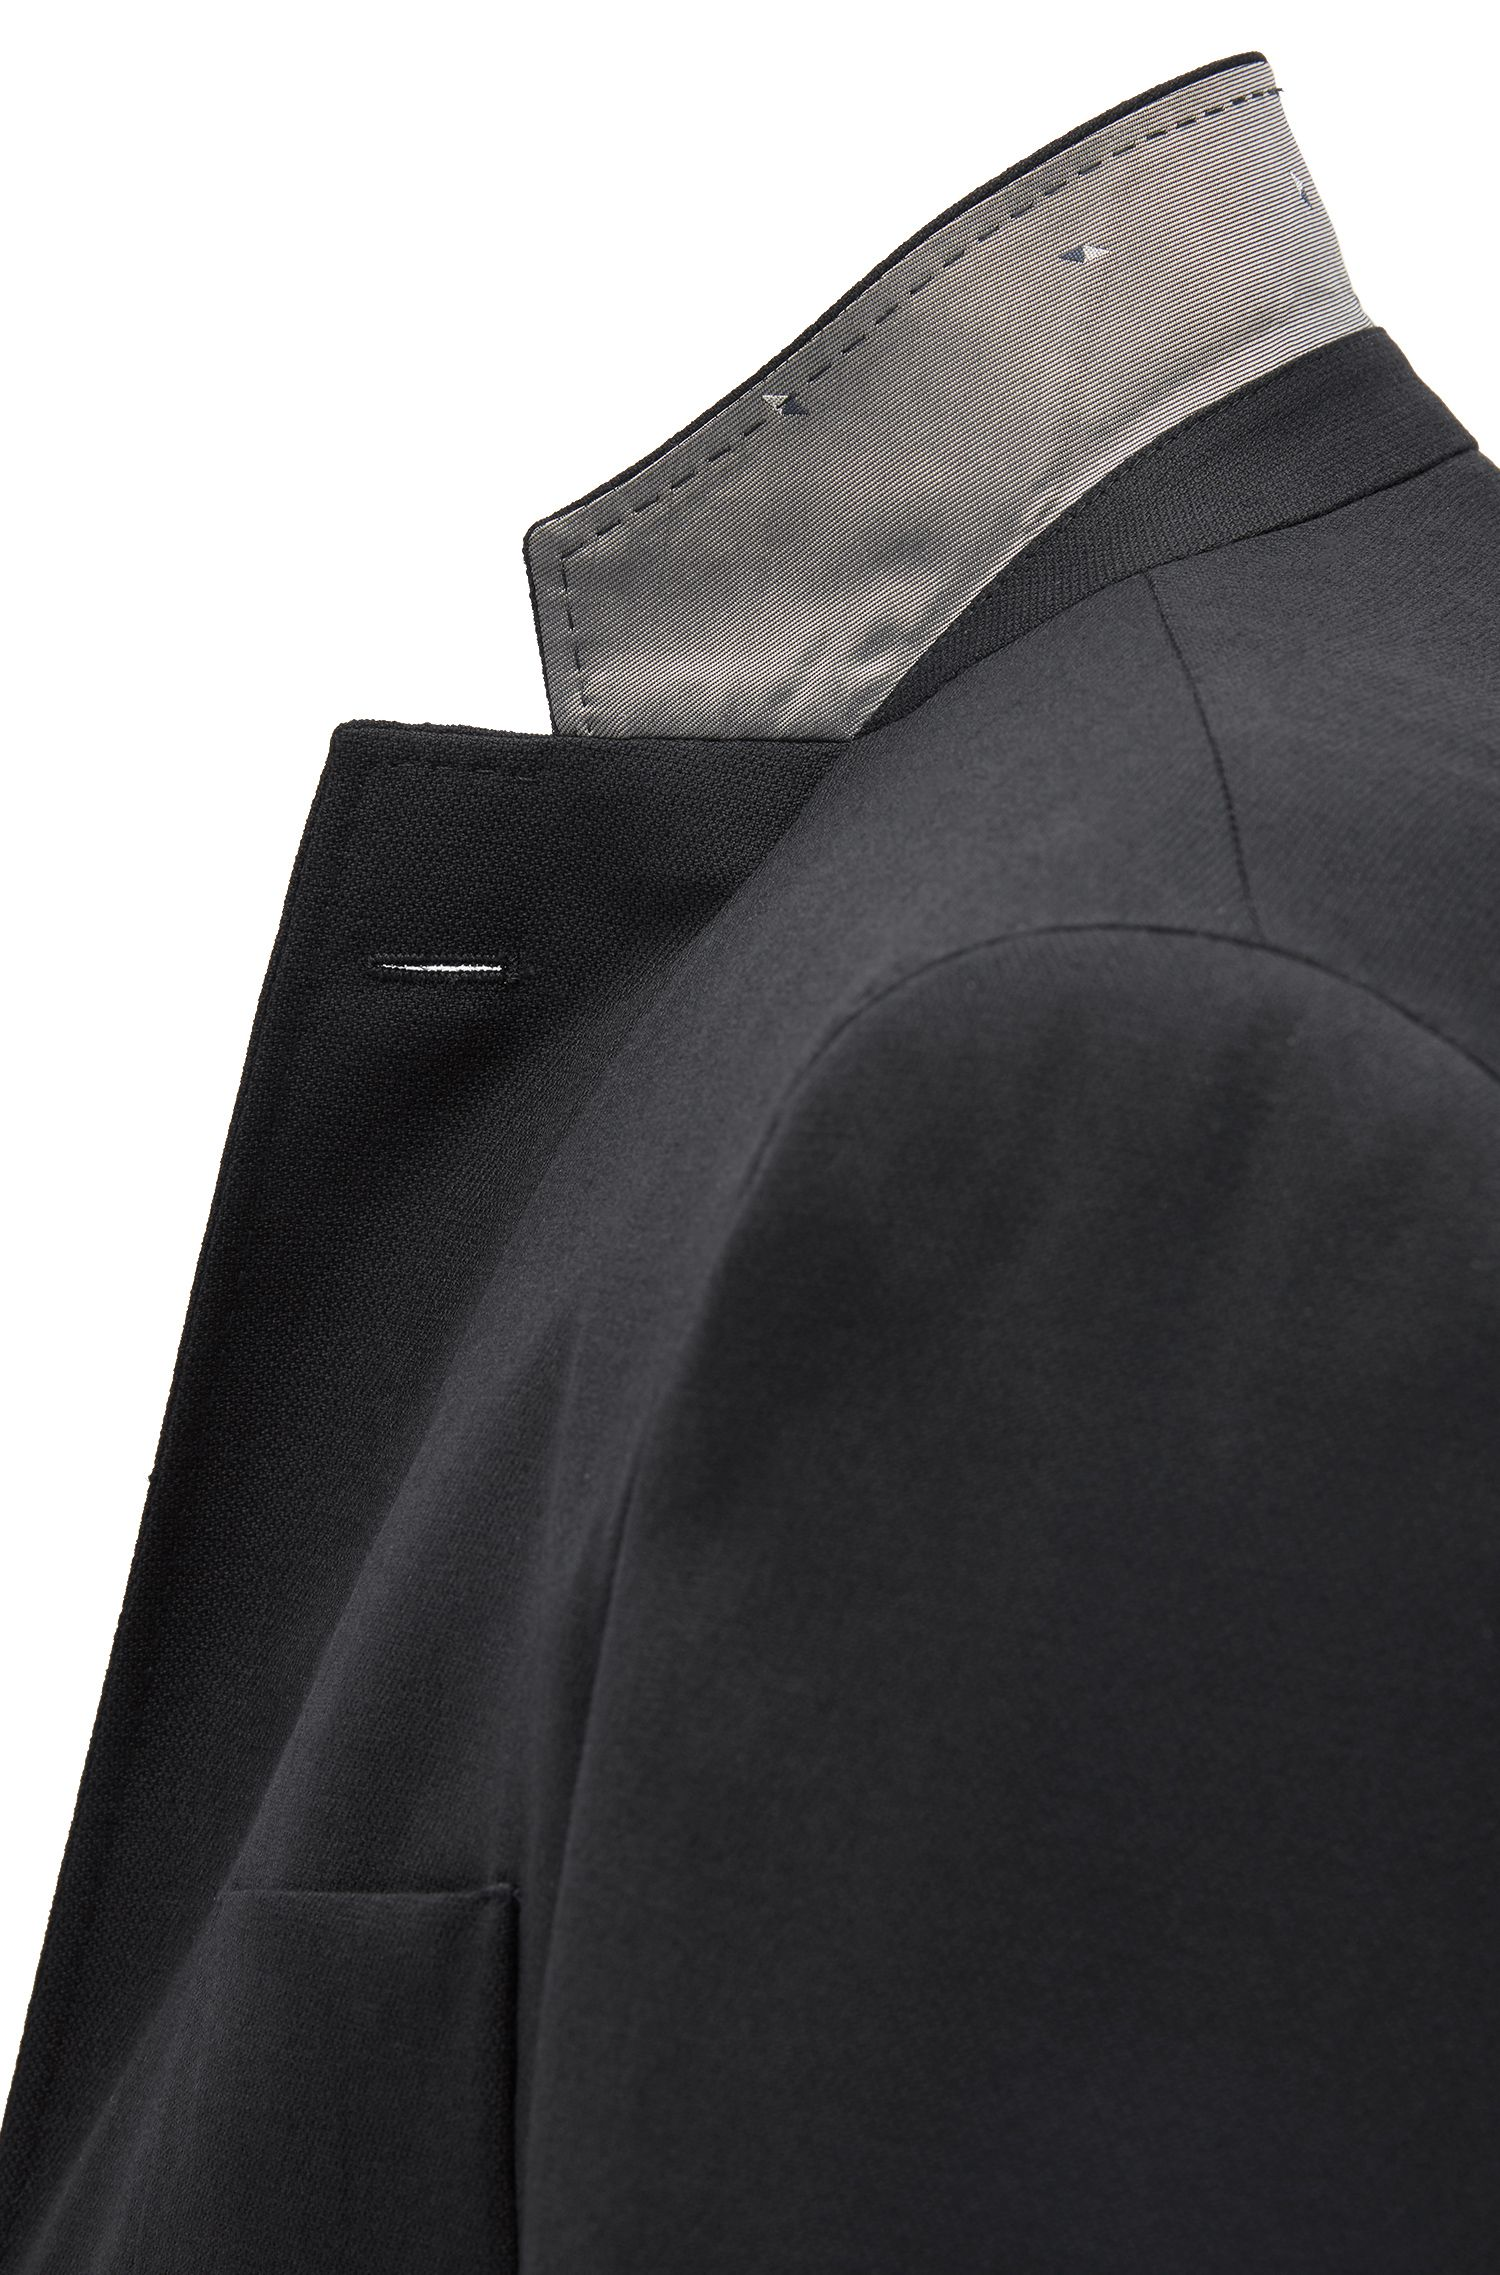 Giacca extra slim fit in lana vergine